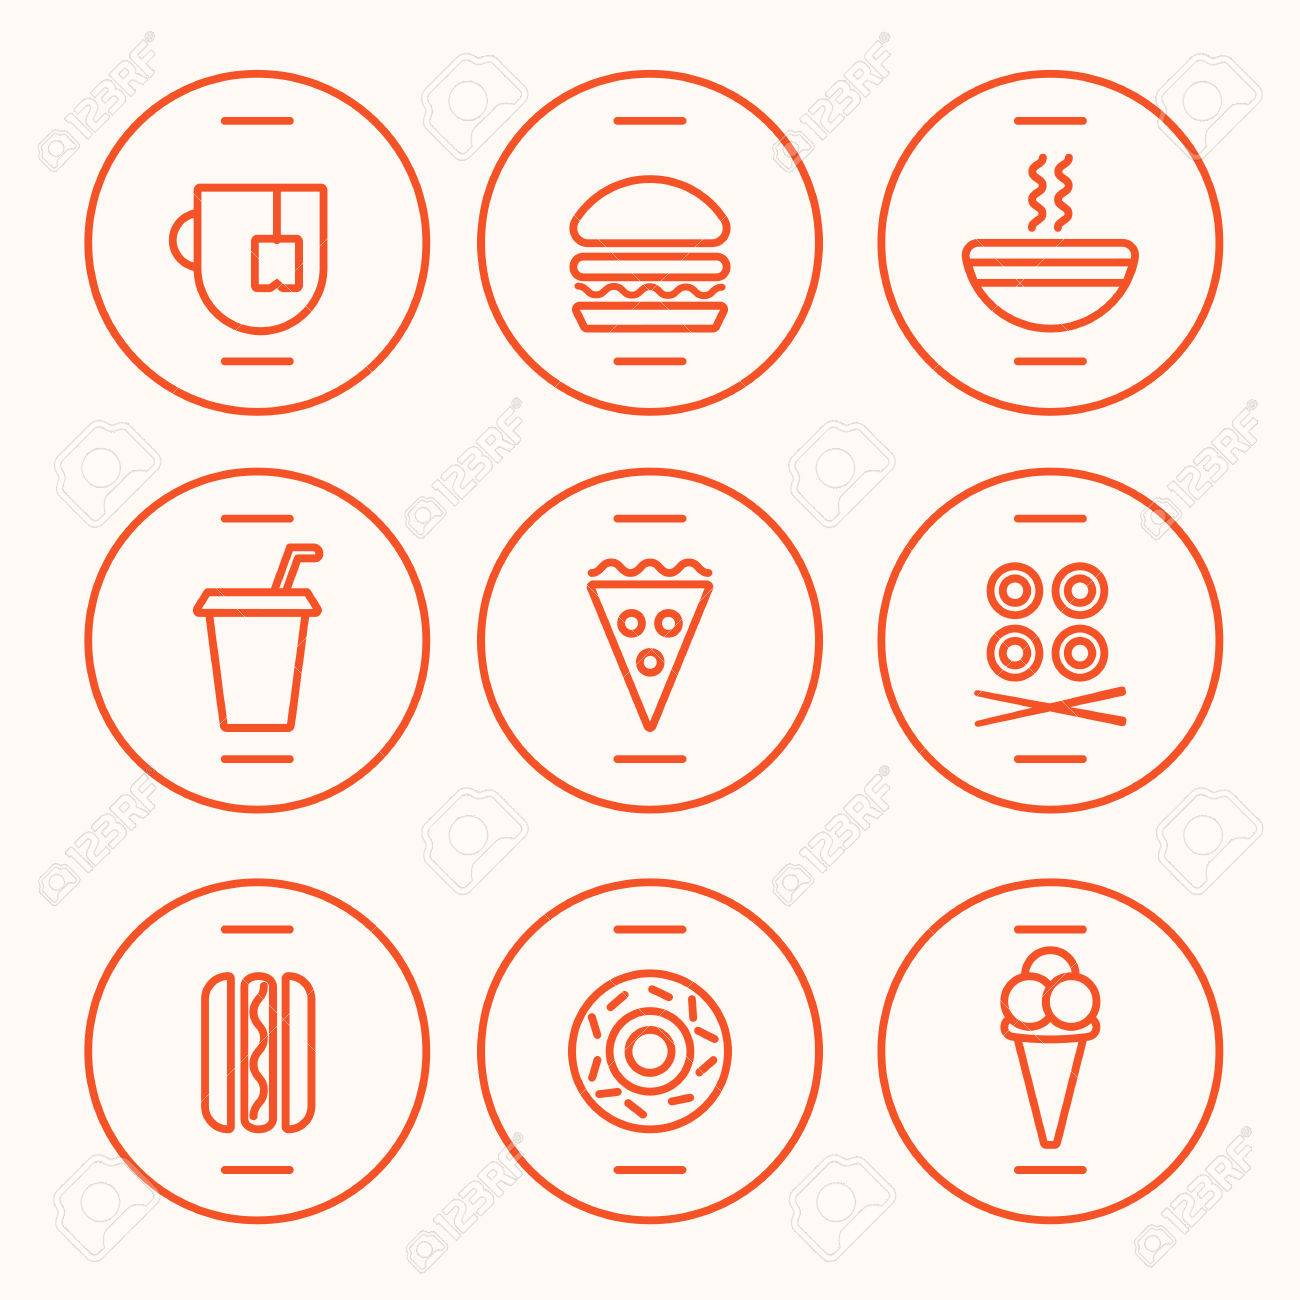 Set of Fast Food Icons performed in the last illustration trends. Hot dog, hamburger, tea, hot soup, cola, pizza, rolls, hotdog, donut, icecream symbolic icons. Fully editable vector illustration. - 46141902